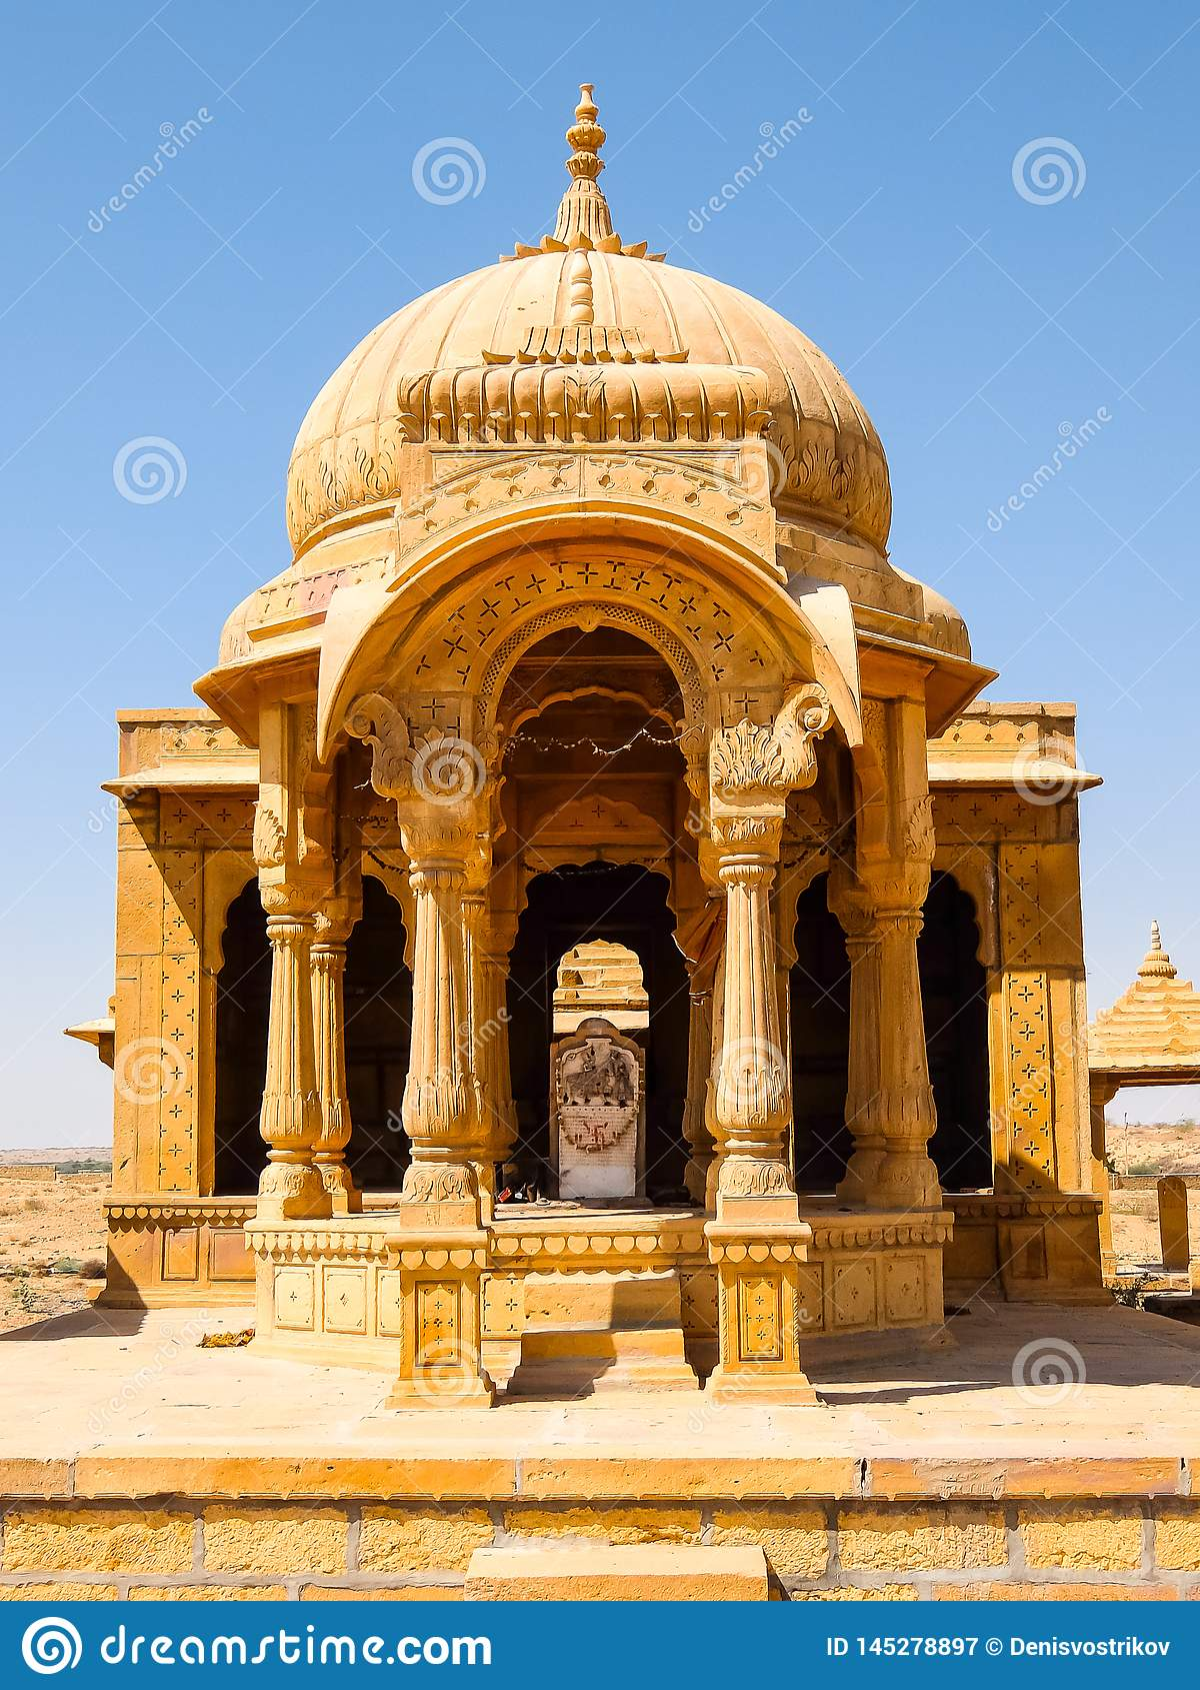 Vyas查特里建筑学贾沙梅尔堡垒的